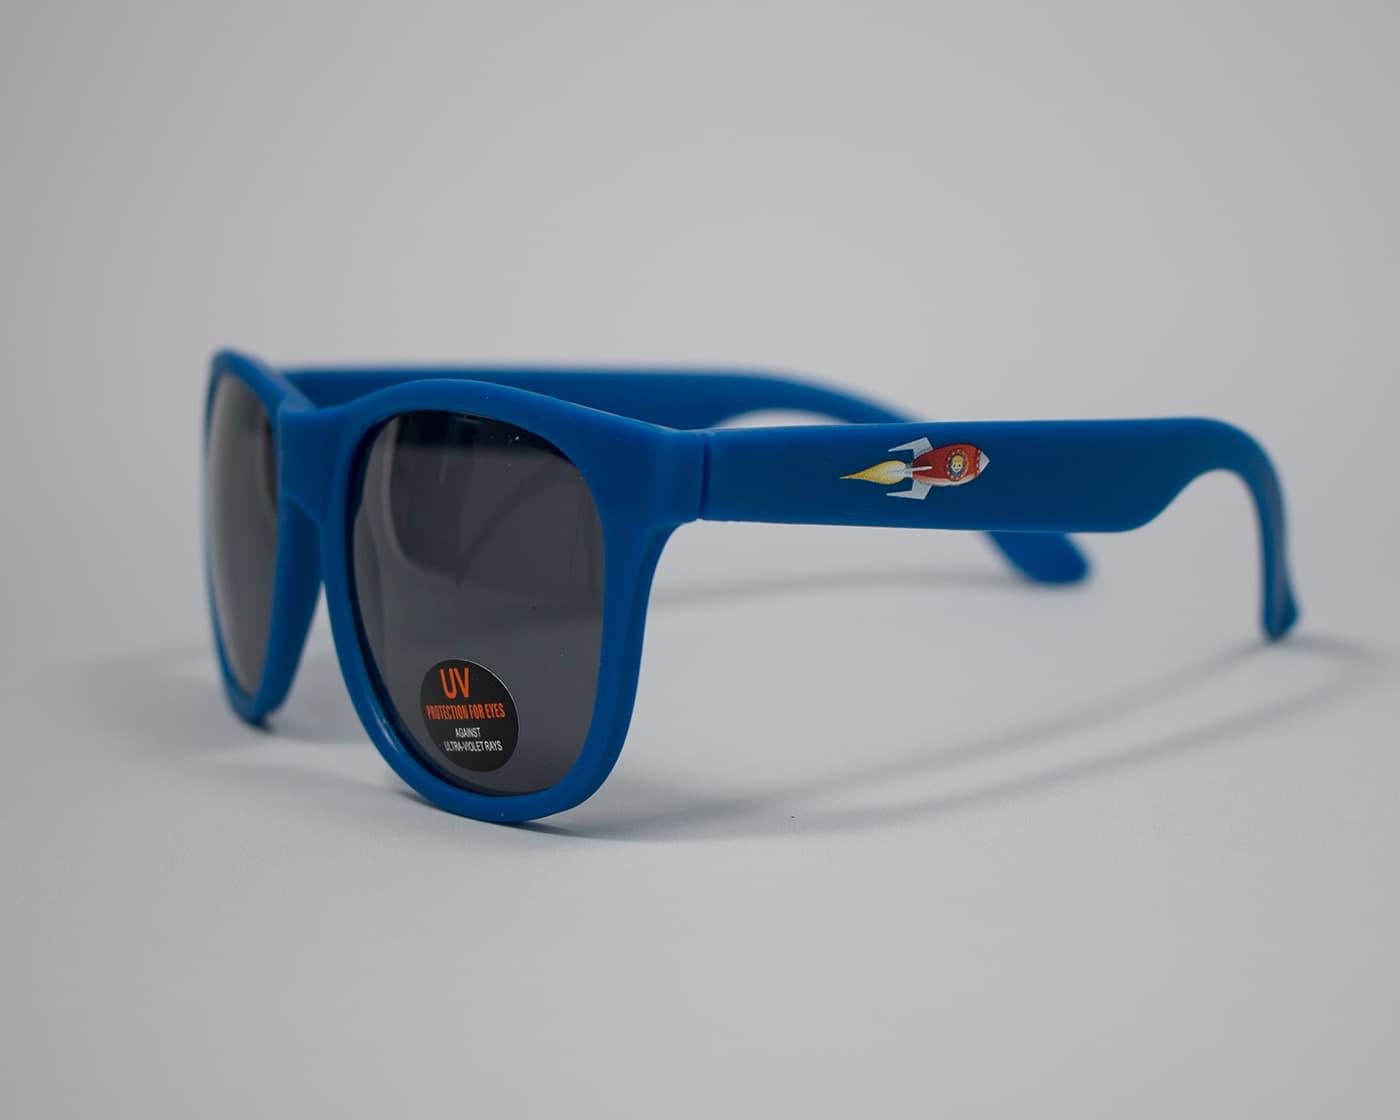 Promotional-Sunglasses